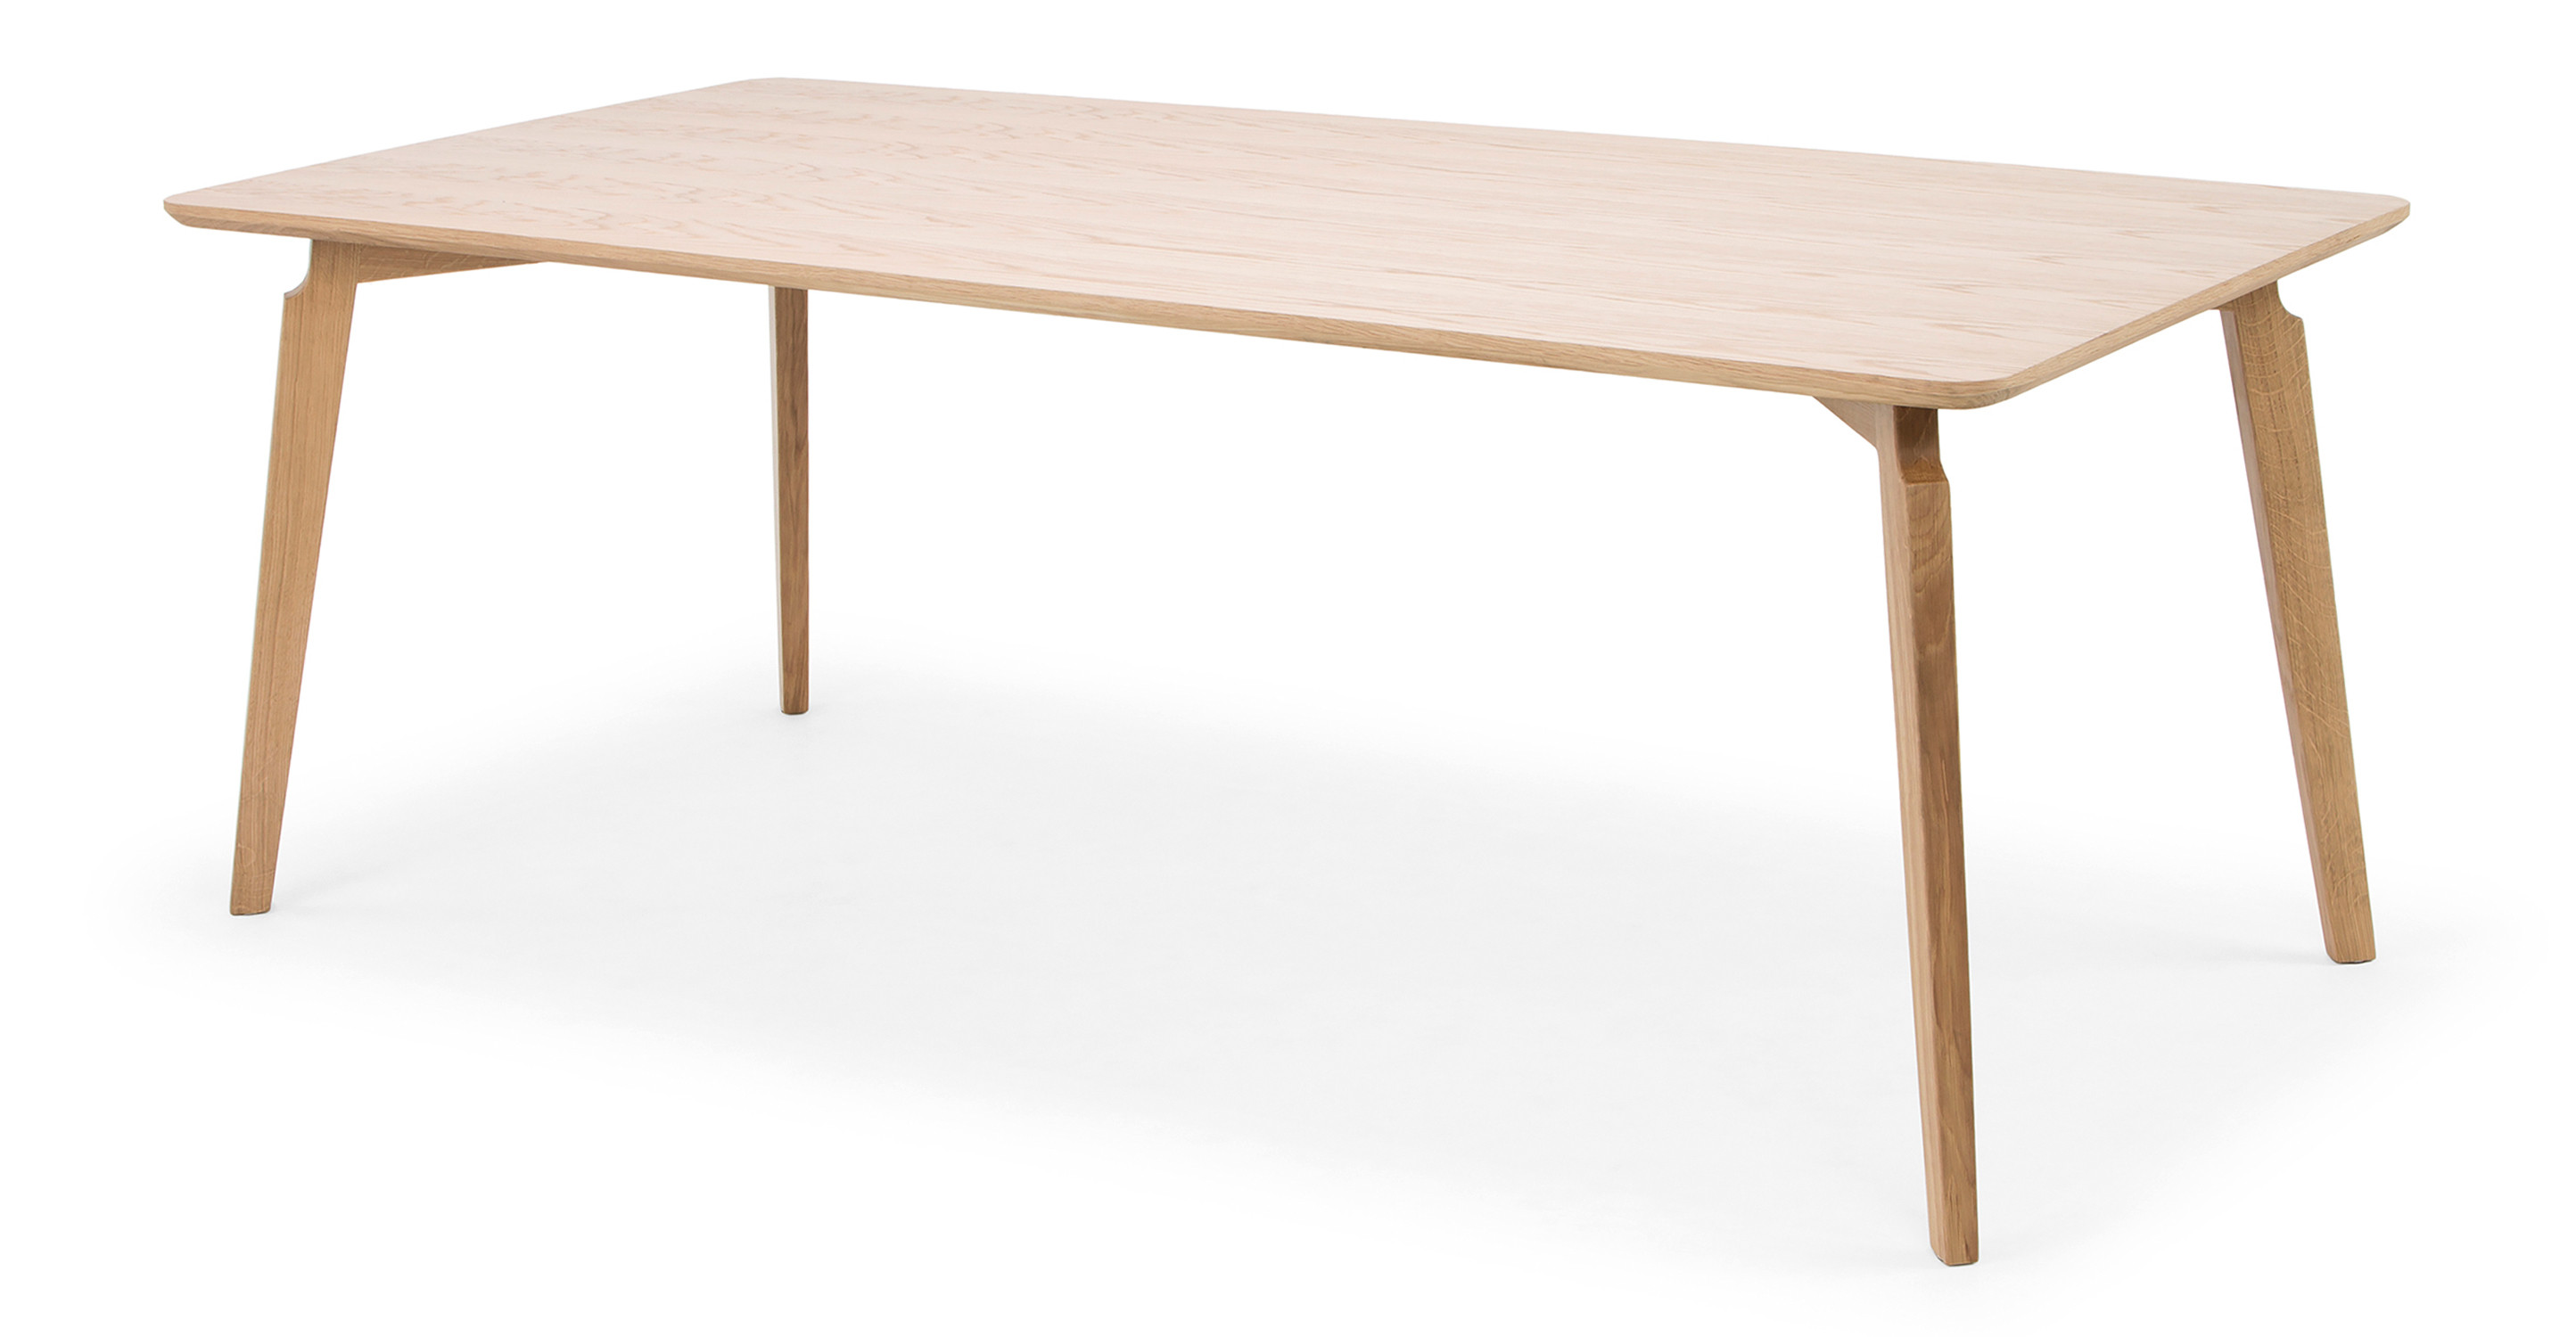 "Kilm 78"" Dining Table, Natural Oak"